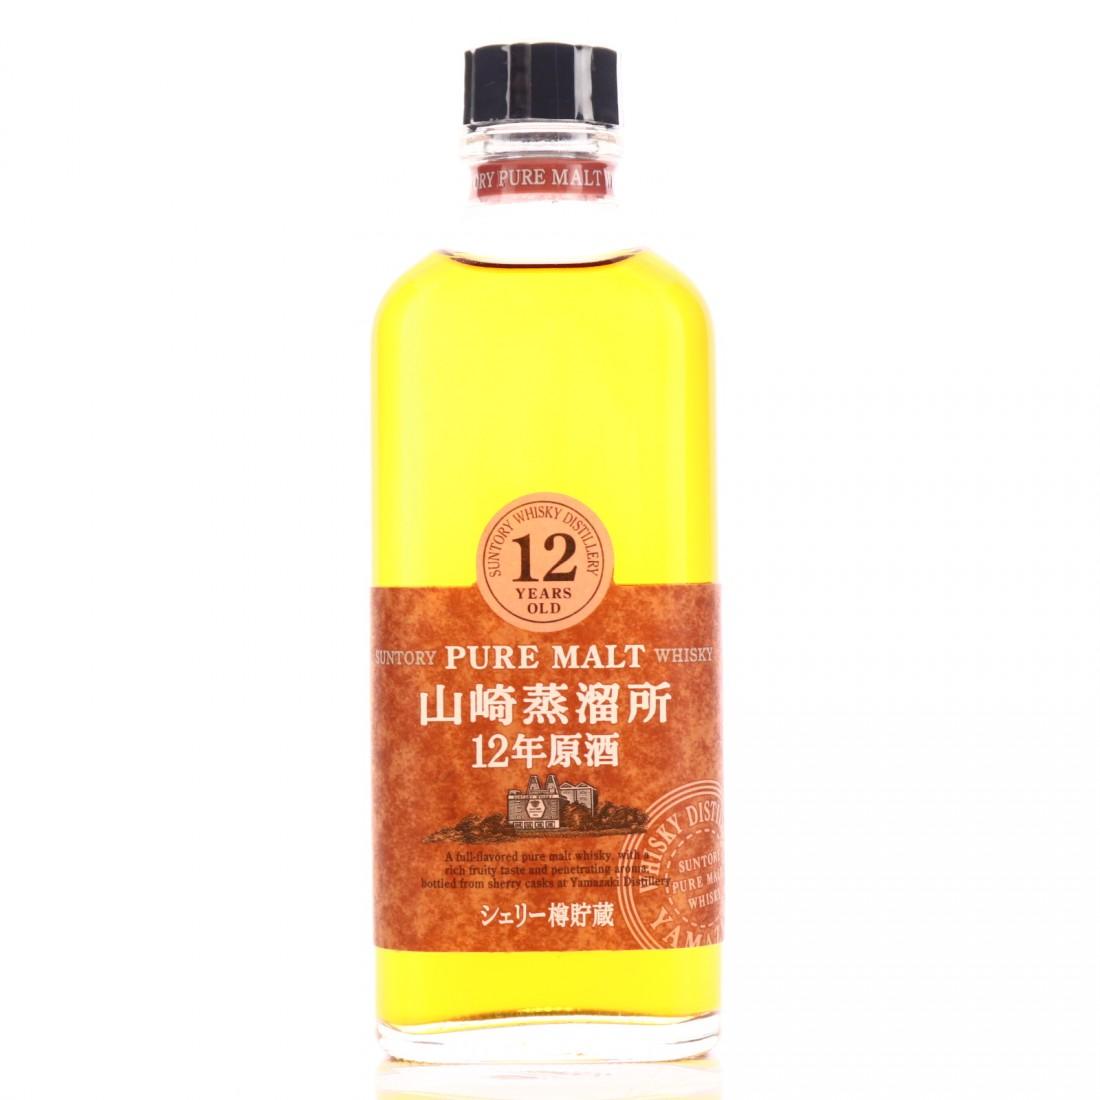 Yamazaki 12 Year Old Sherry Casks 15cl / Distillery Exclusive